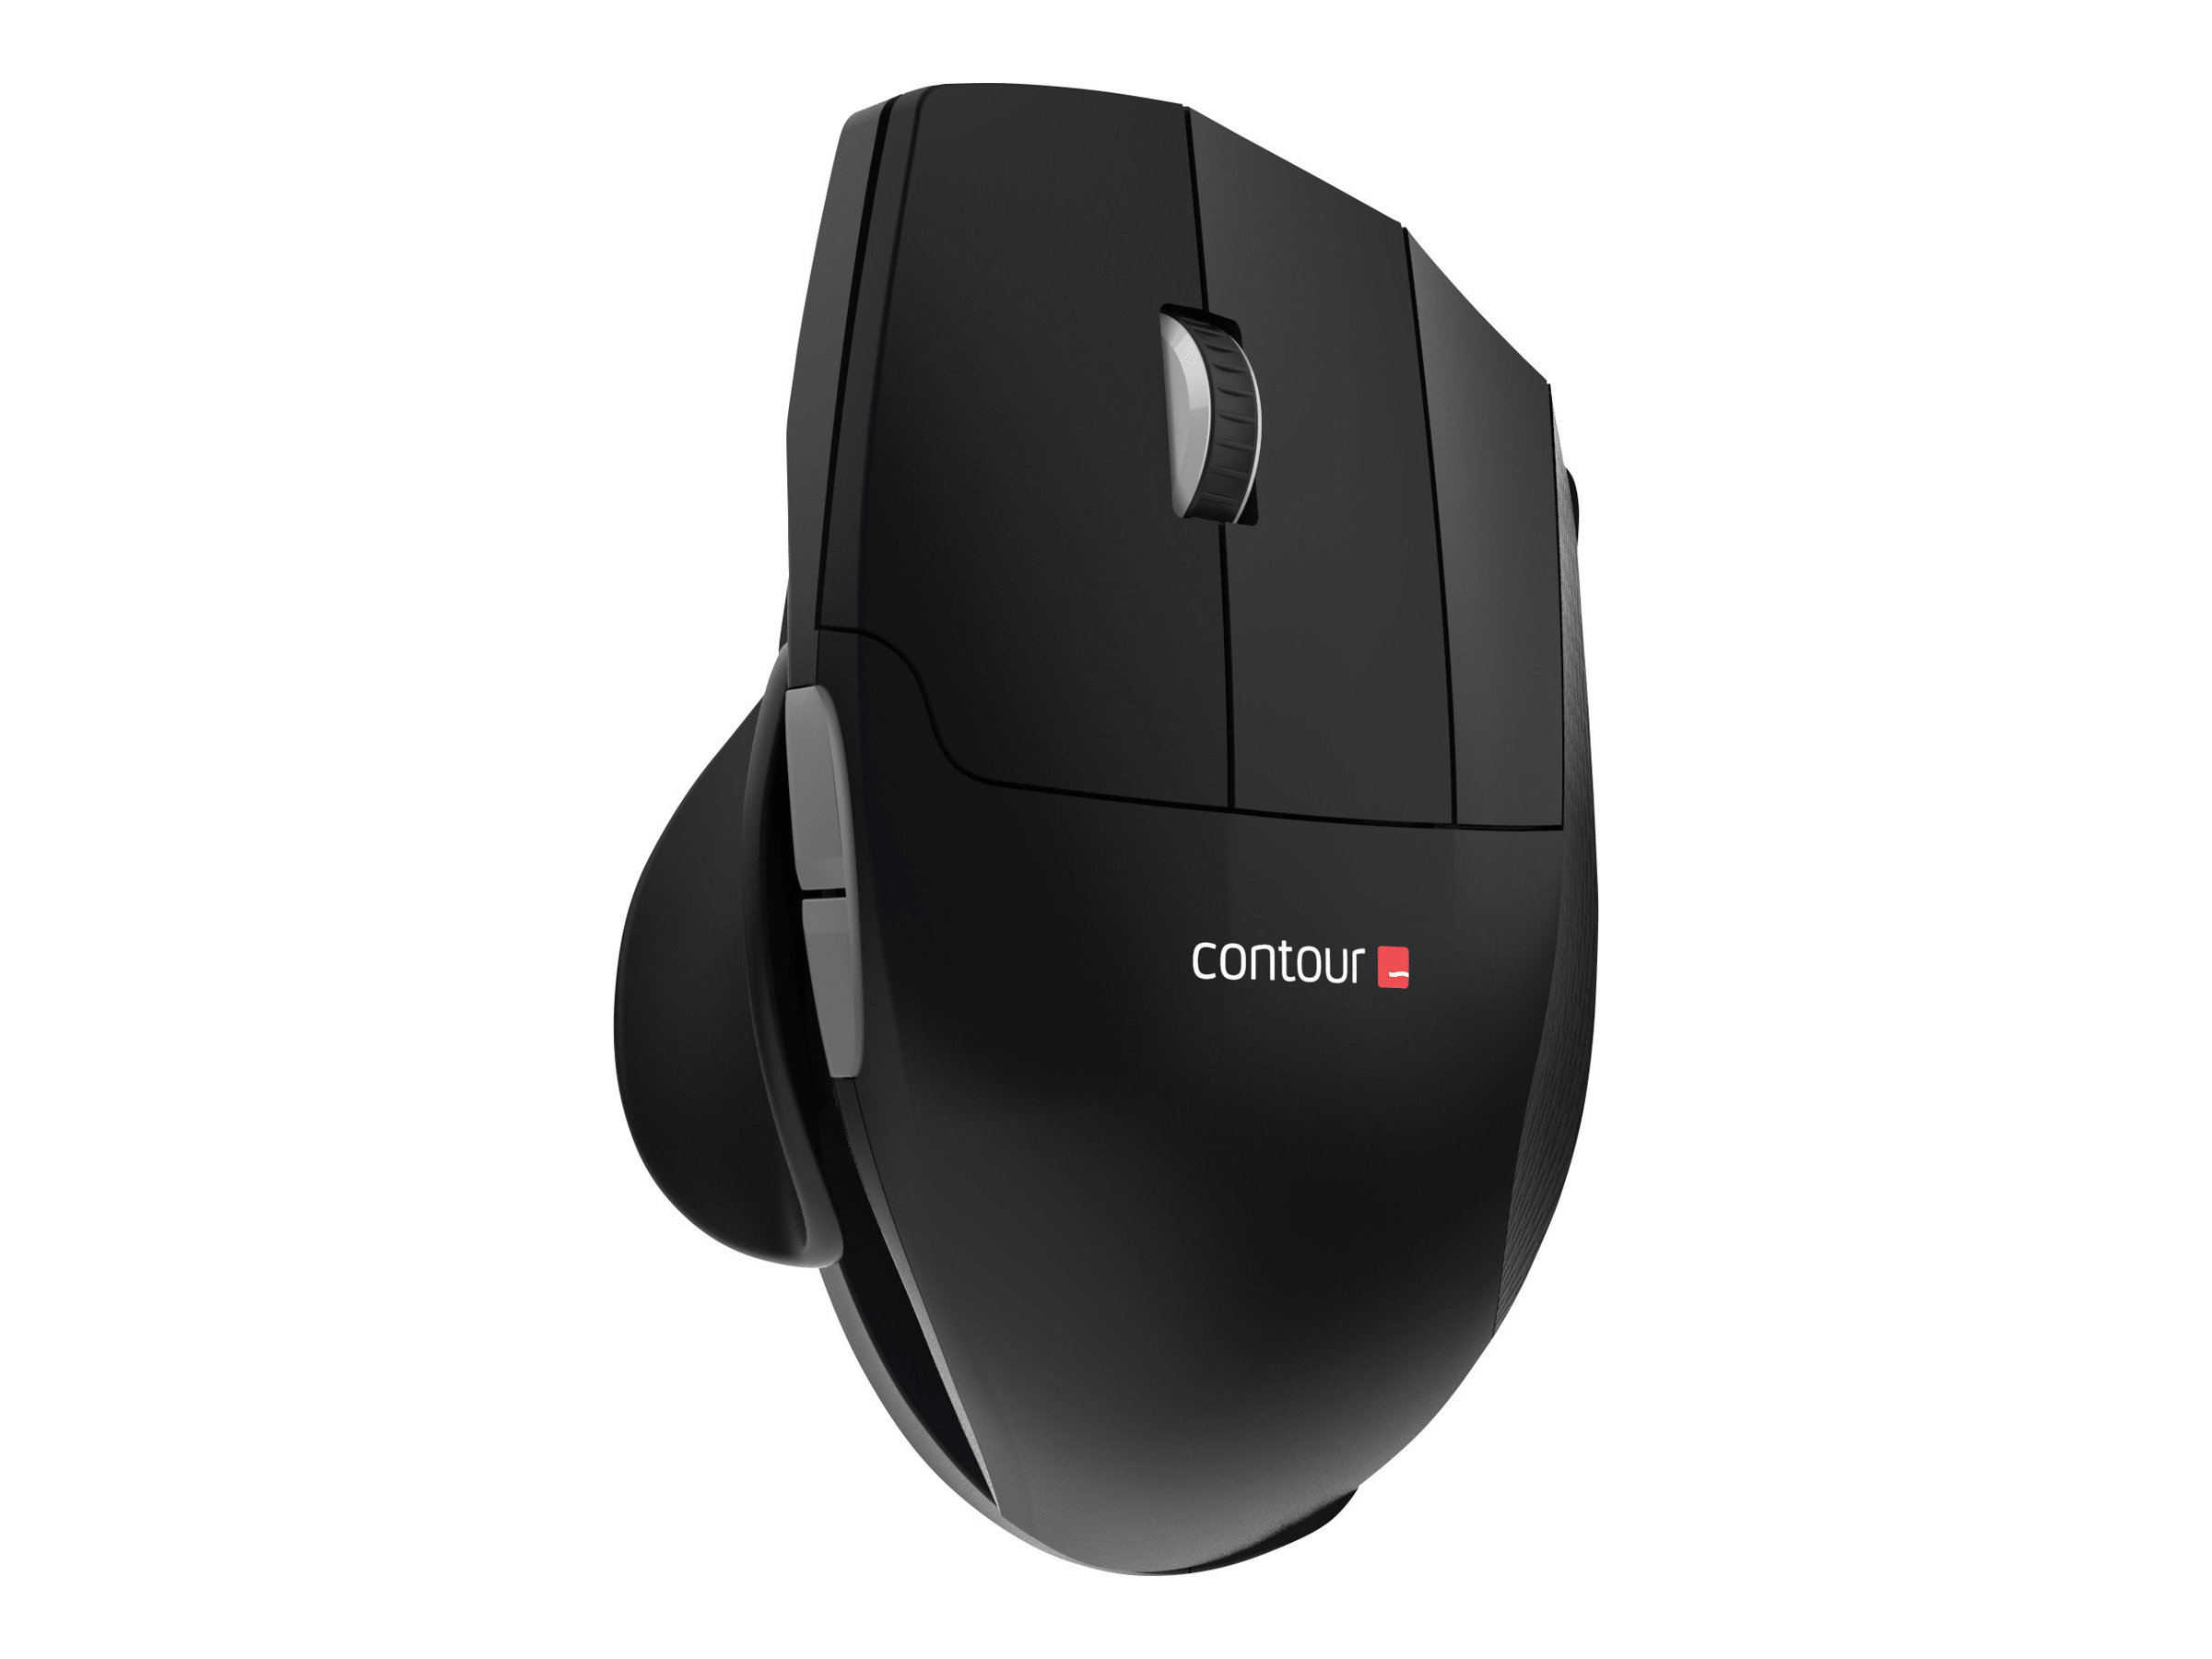 Contour Unimouse - Maus - ergonomisch - Infrarot - 7 Tasten - kabellos - 2.4 GHz - kabelloser Empfänger (USB)